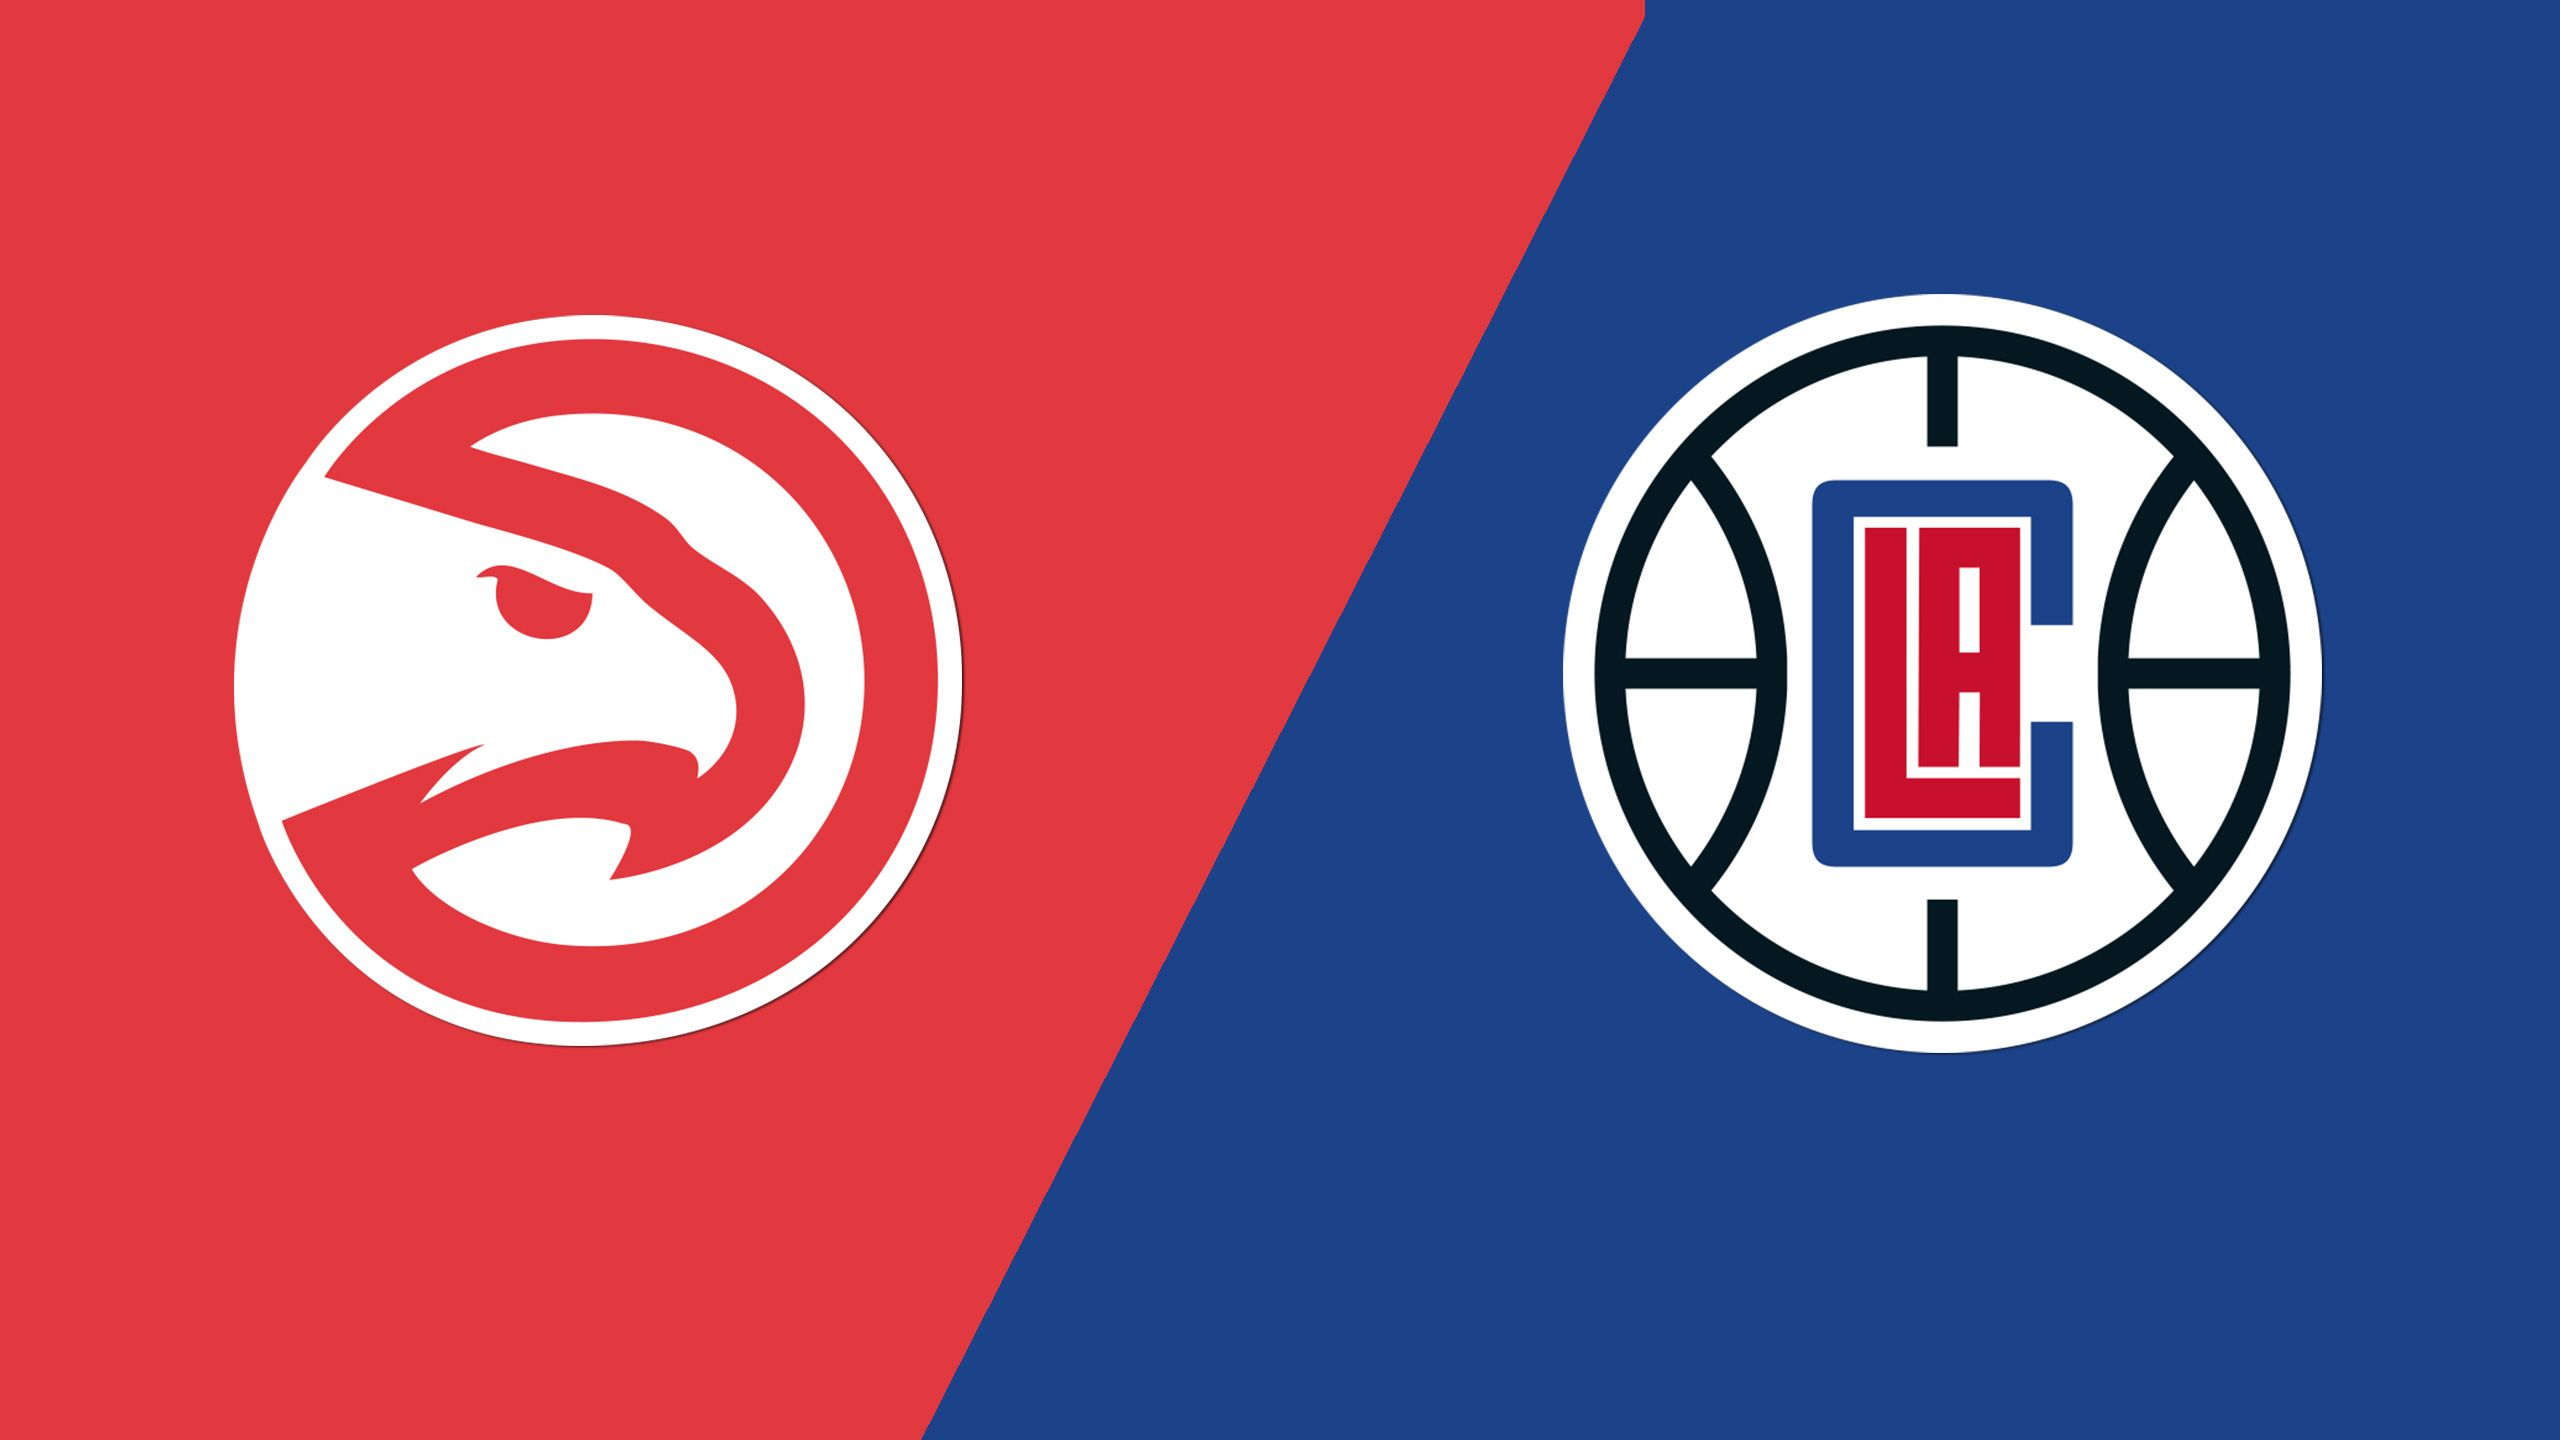 Atlanta Hawks vs. LA Clippers (Consolation Round)